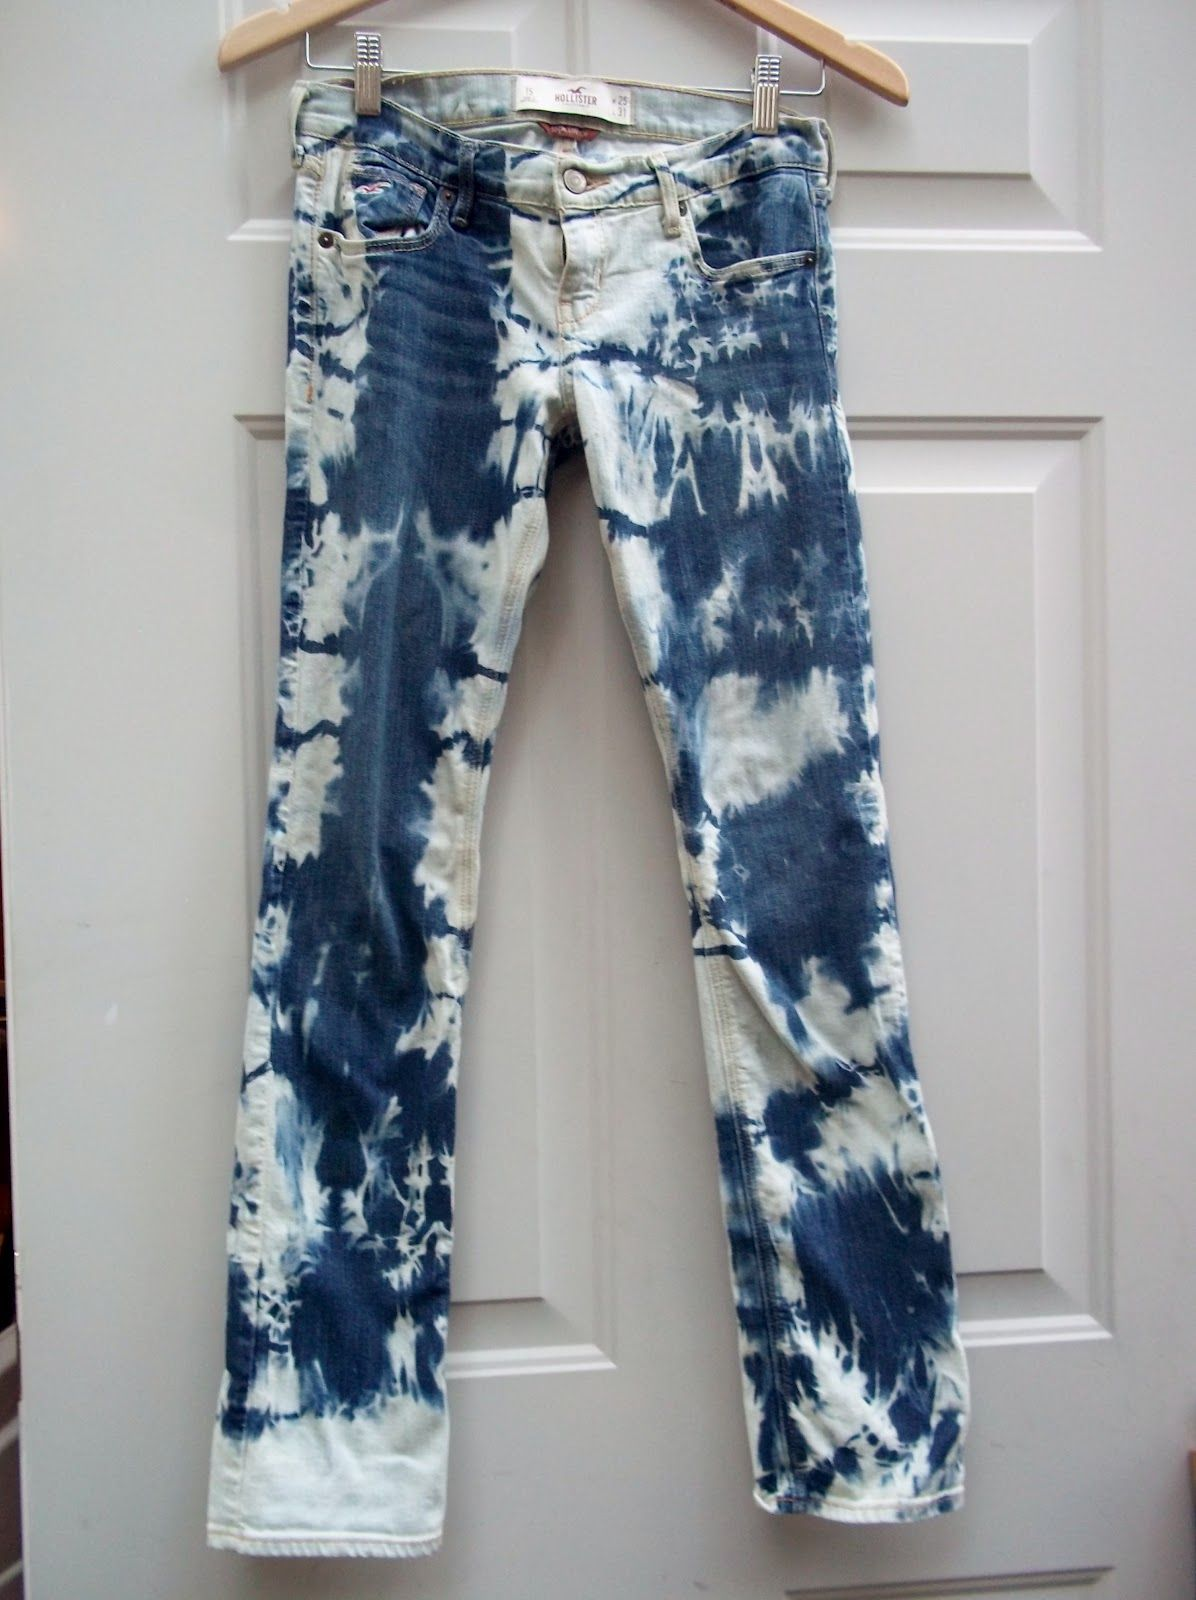 Wildcat Diy Tie Dye Jeans Bleached Jeans Diy Tie Dye Jeans Jeans Diy